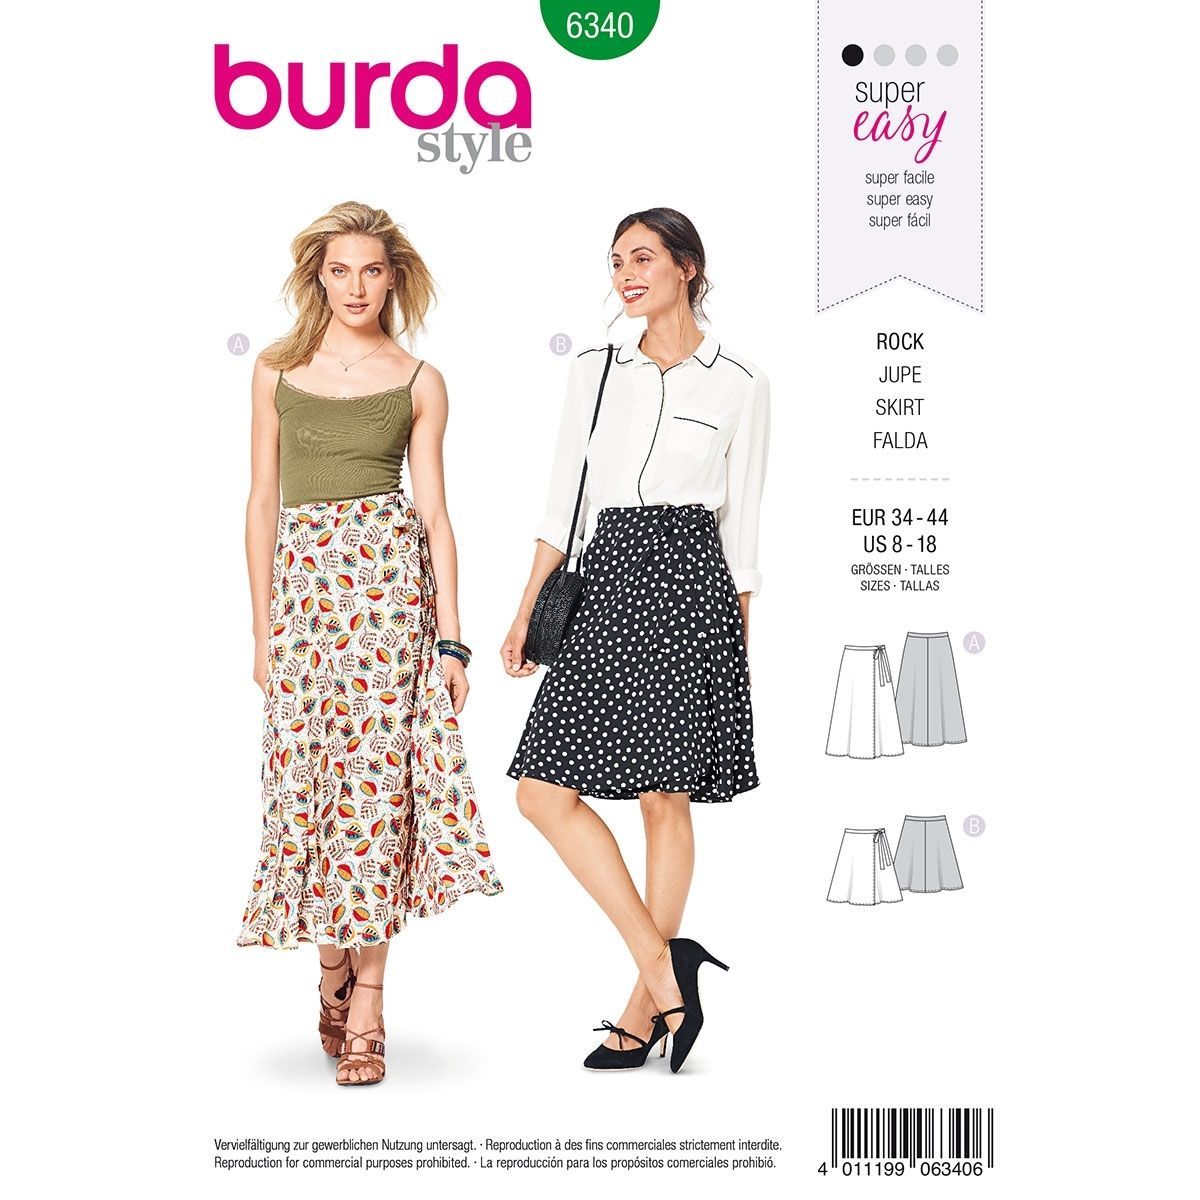 37439ba073 Misses Wrap Skirt Burda Sewing Pattern 6340. Size 8-18   Sew Happy ...